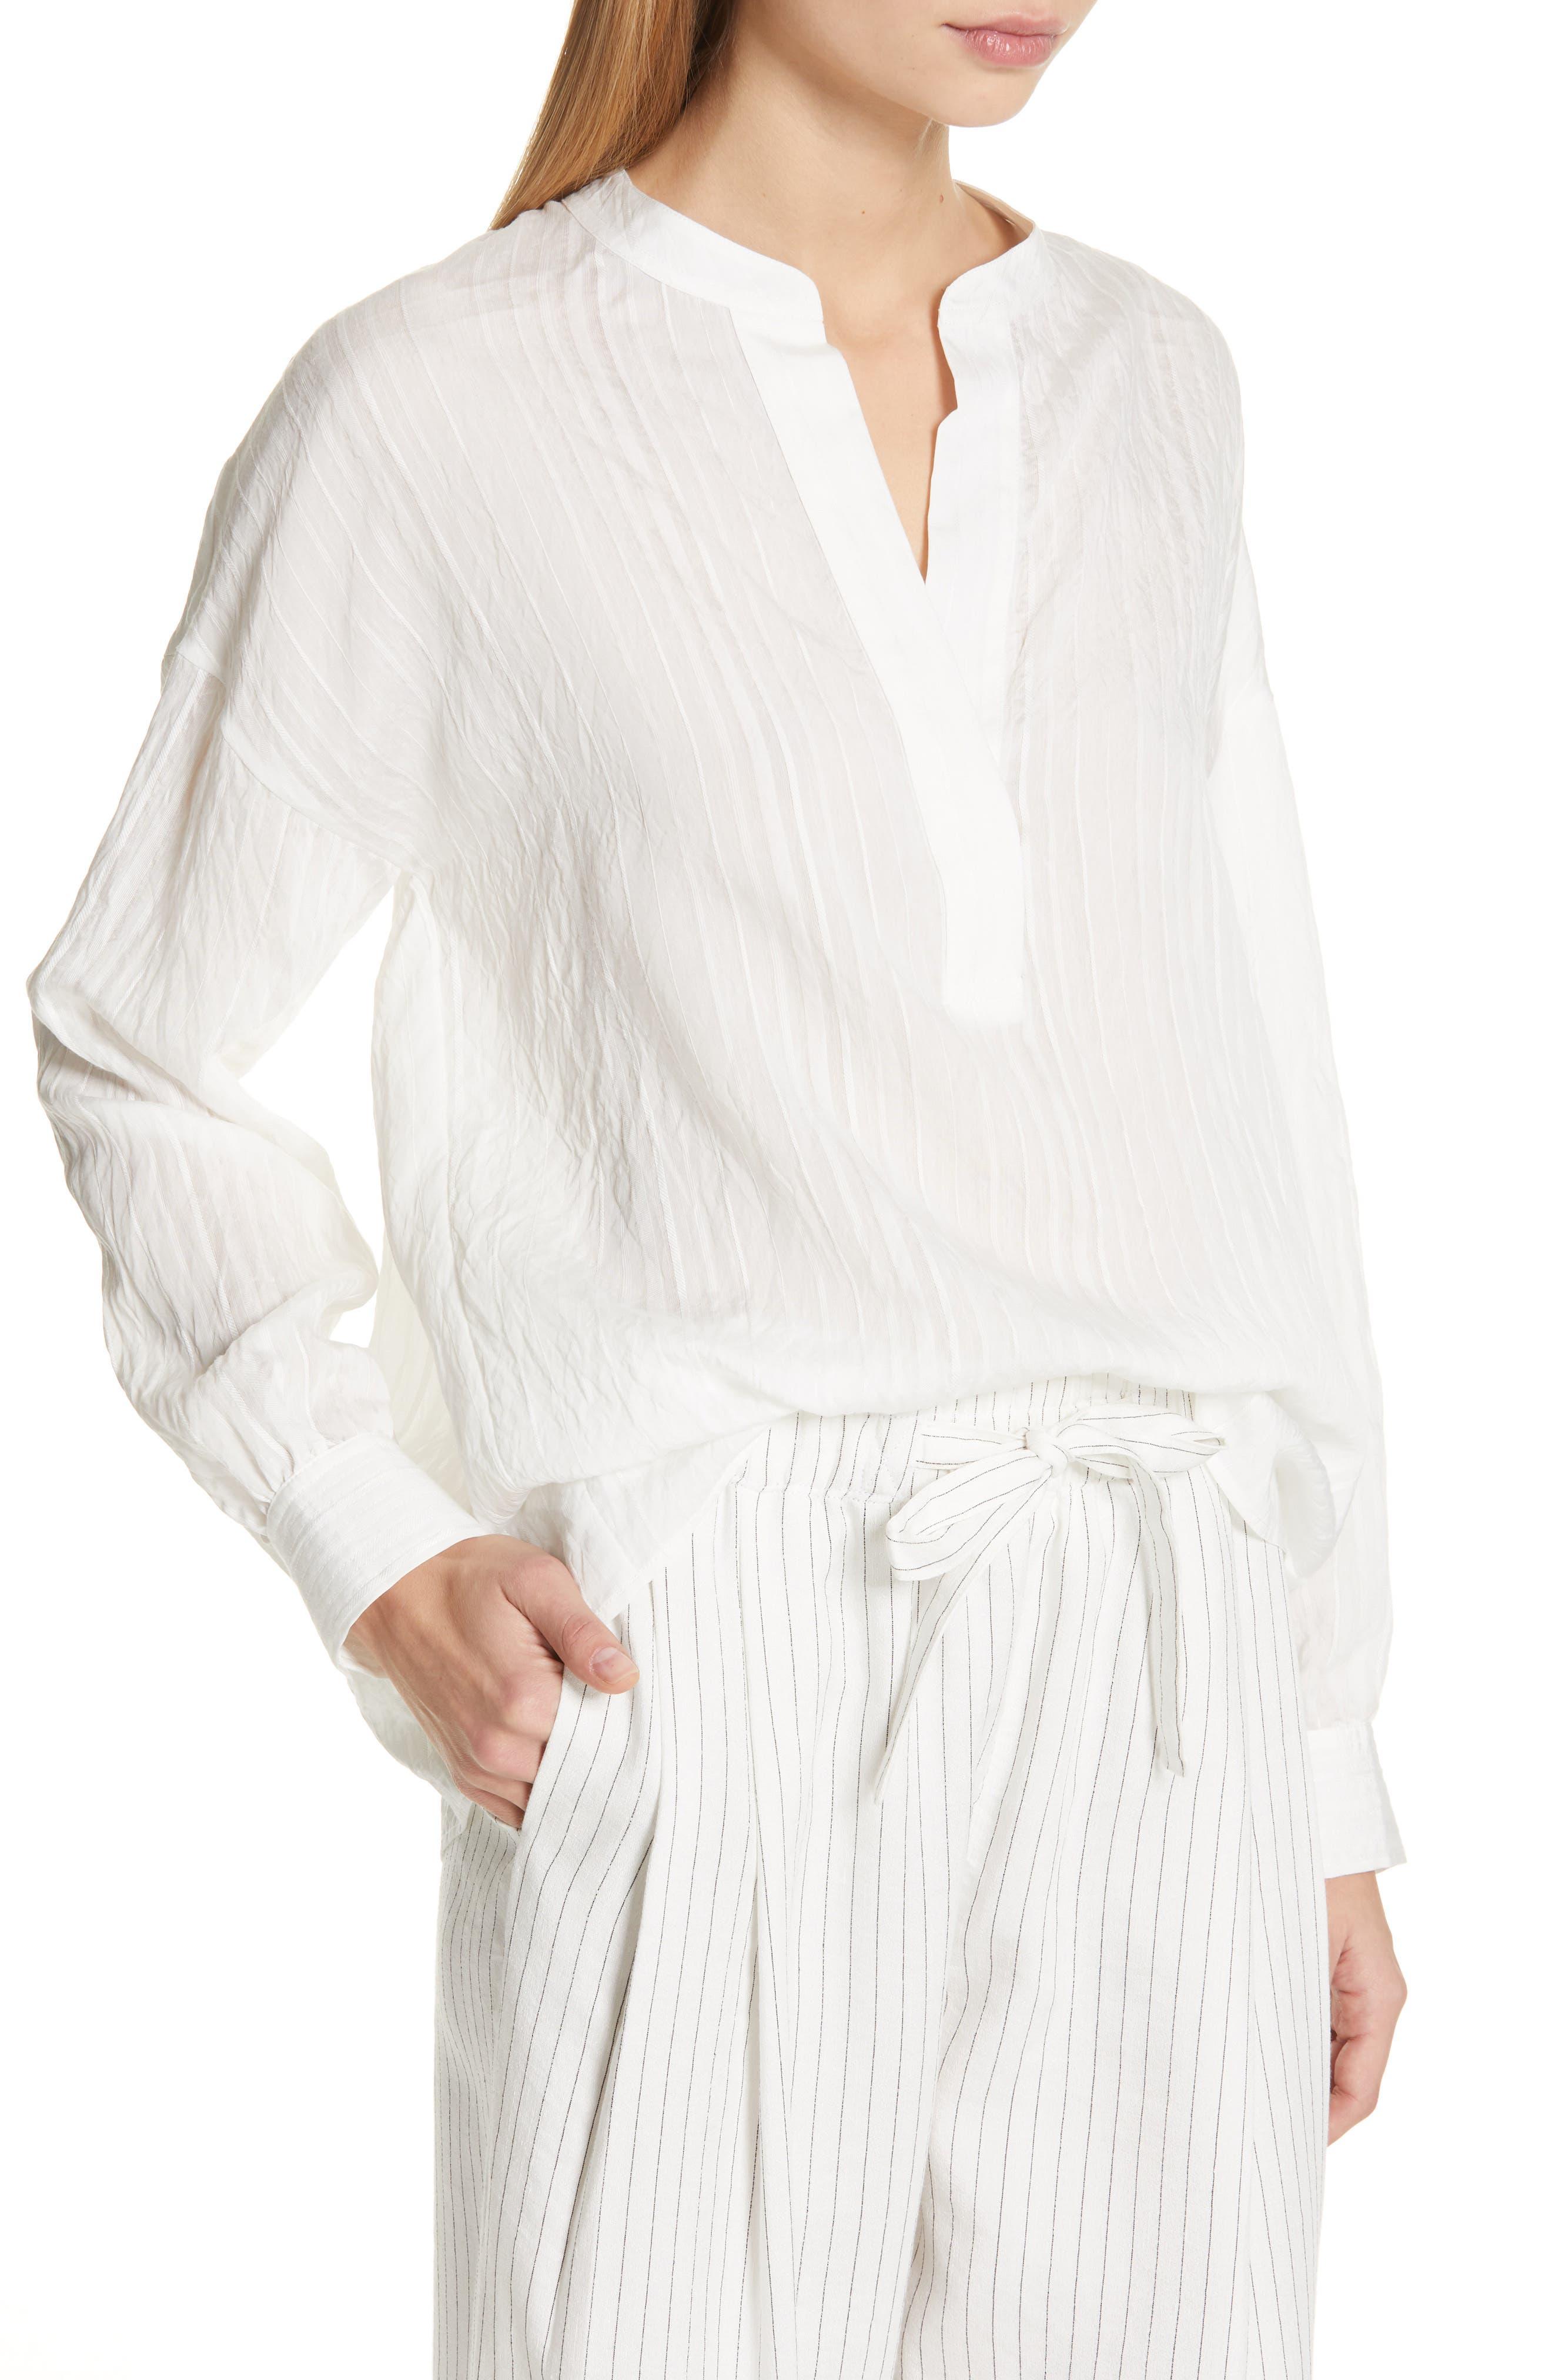 VINCE, Stripe Drop Sleeve Shirt, Alternate thumbnail 4, color, OPTIC WHITE